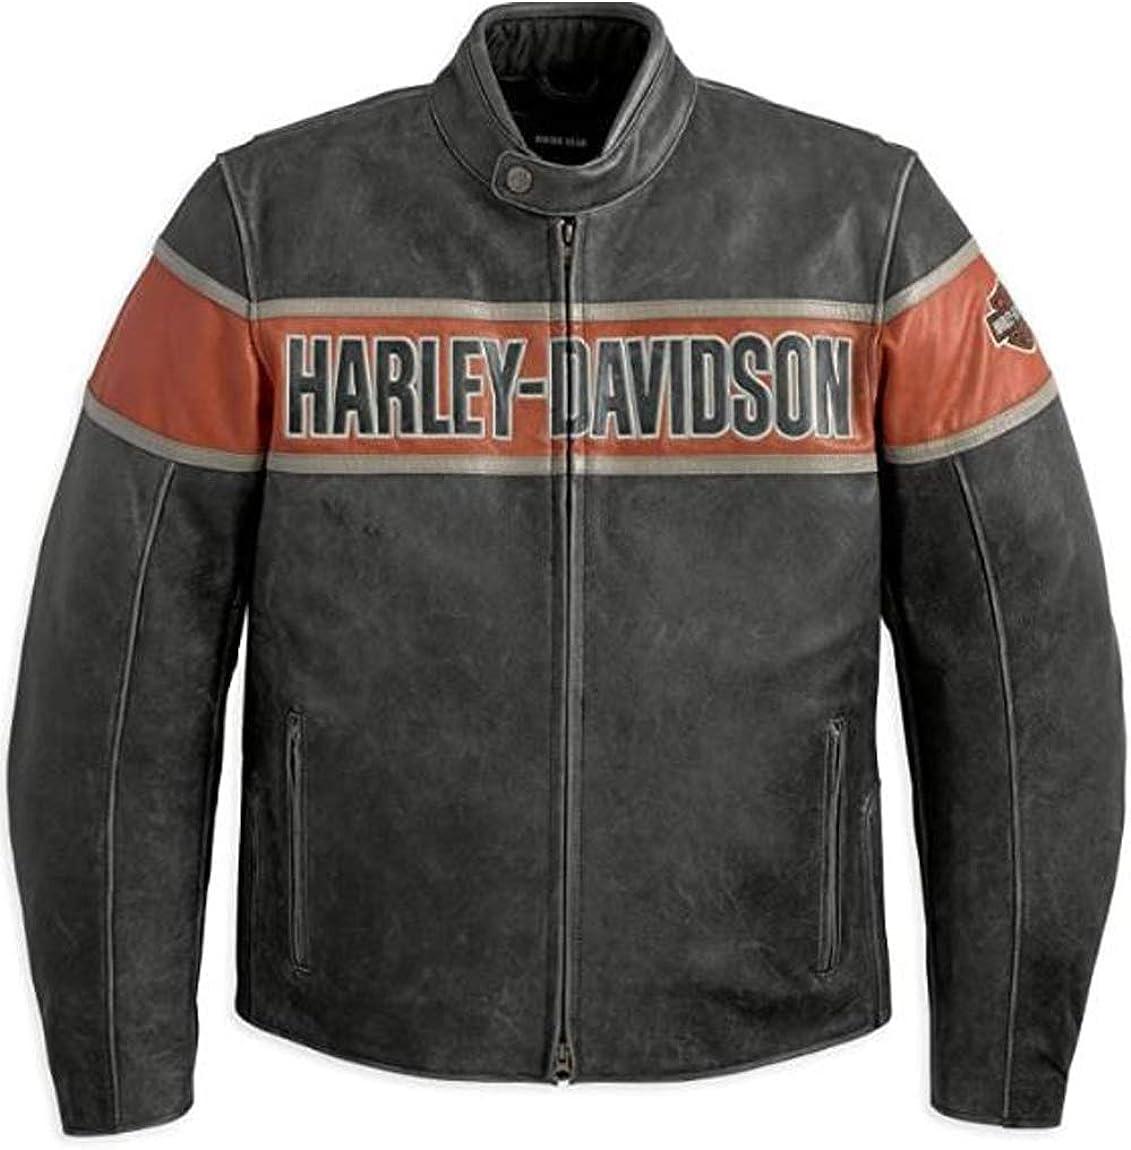 Fashionly Men's Victory Lane Bikers Style Genuine Pigskin Leather Motorbike Cracker Biker Jacket